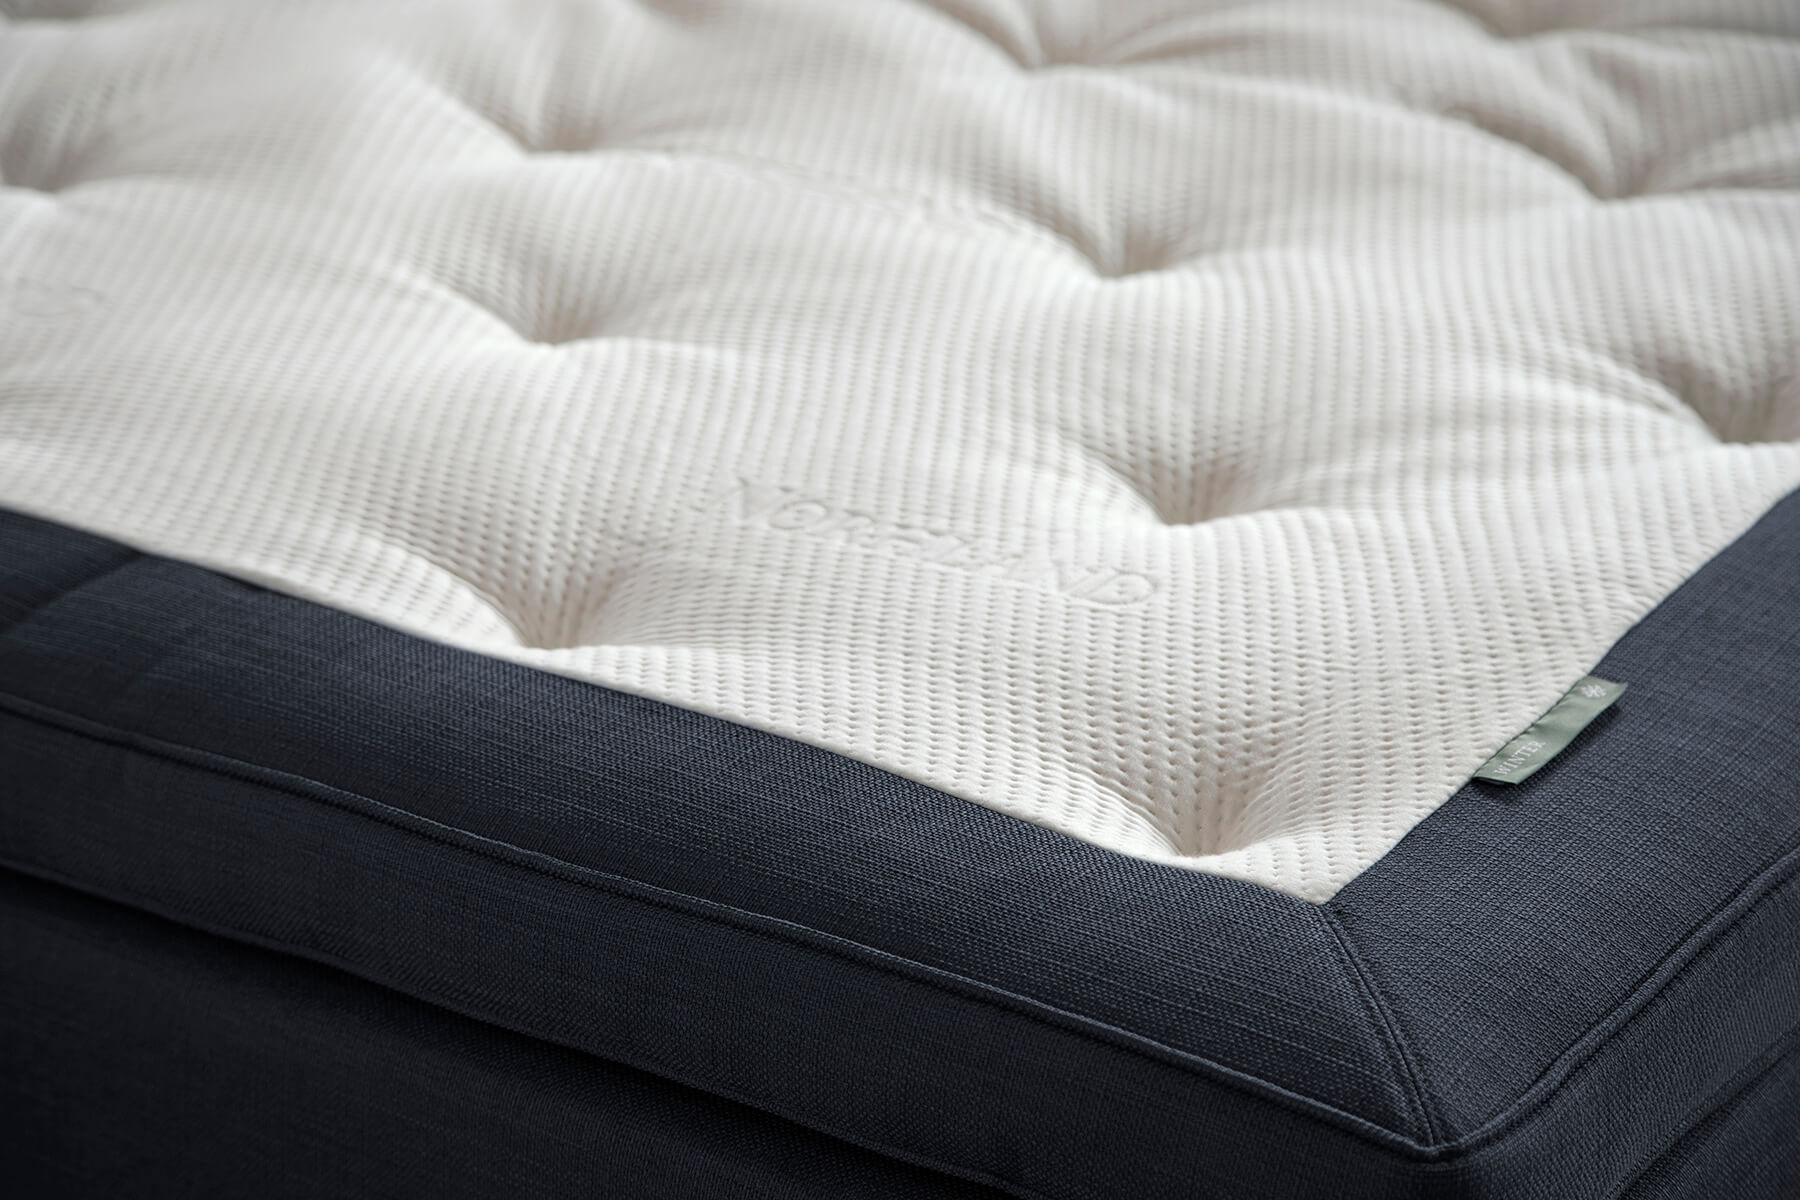 Køb Eksklusiv Topmadras – Latex – BlÃ¥ – 90×200 cm